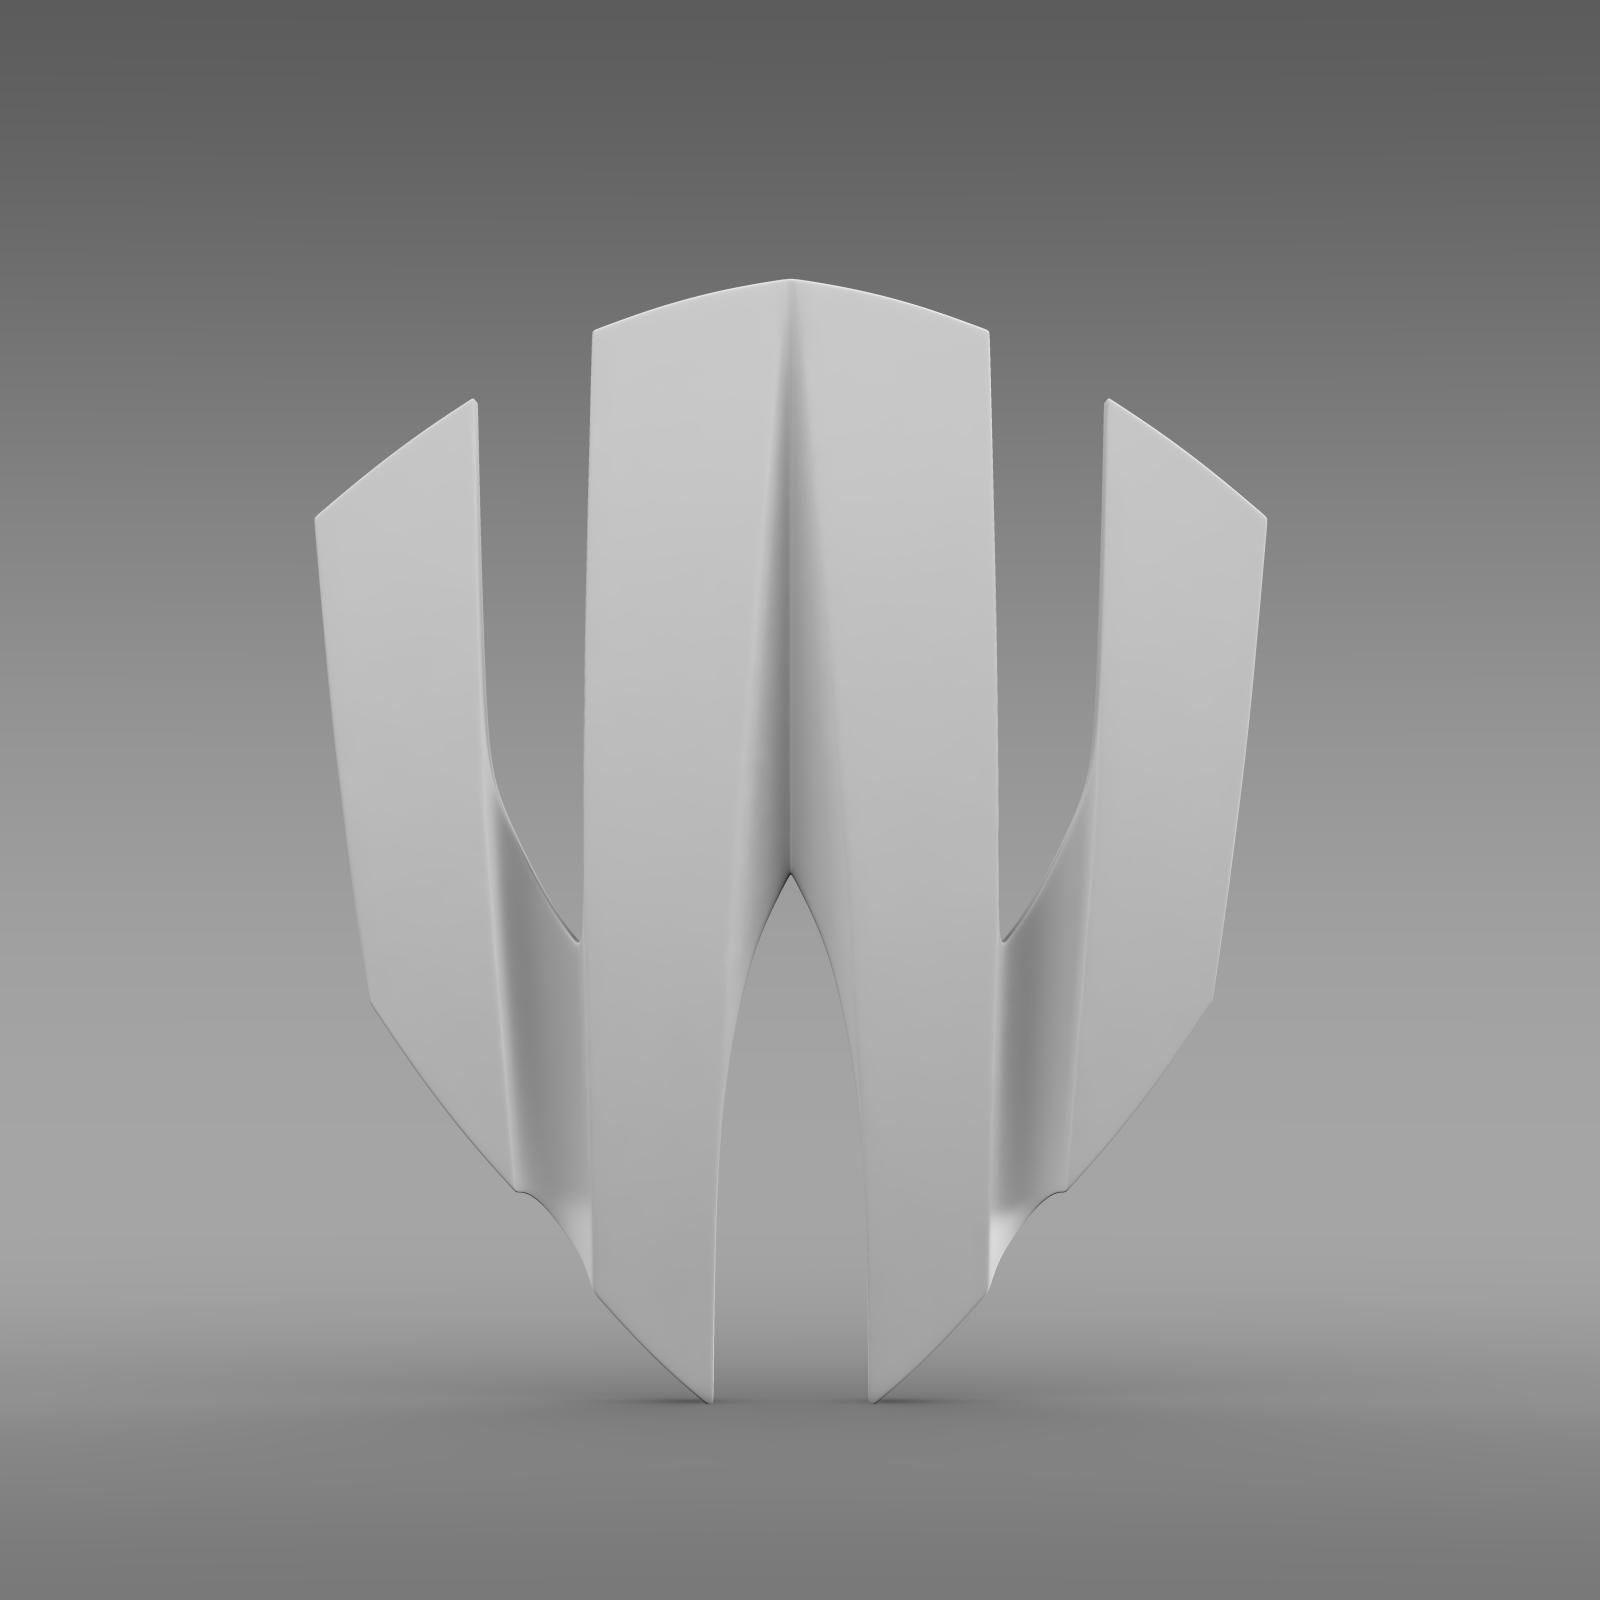 w motors lykan hypersport logo 3d model 3ds max fbx c4d lwo ma mb hrc xsi obj 213249